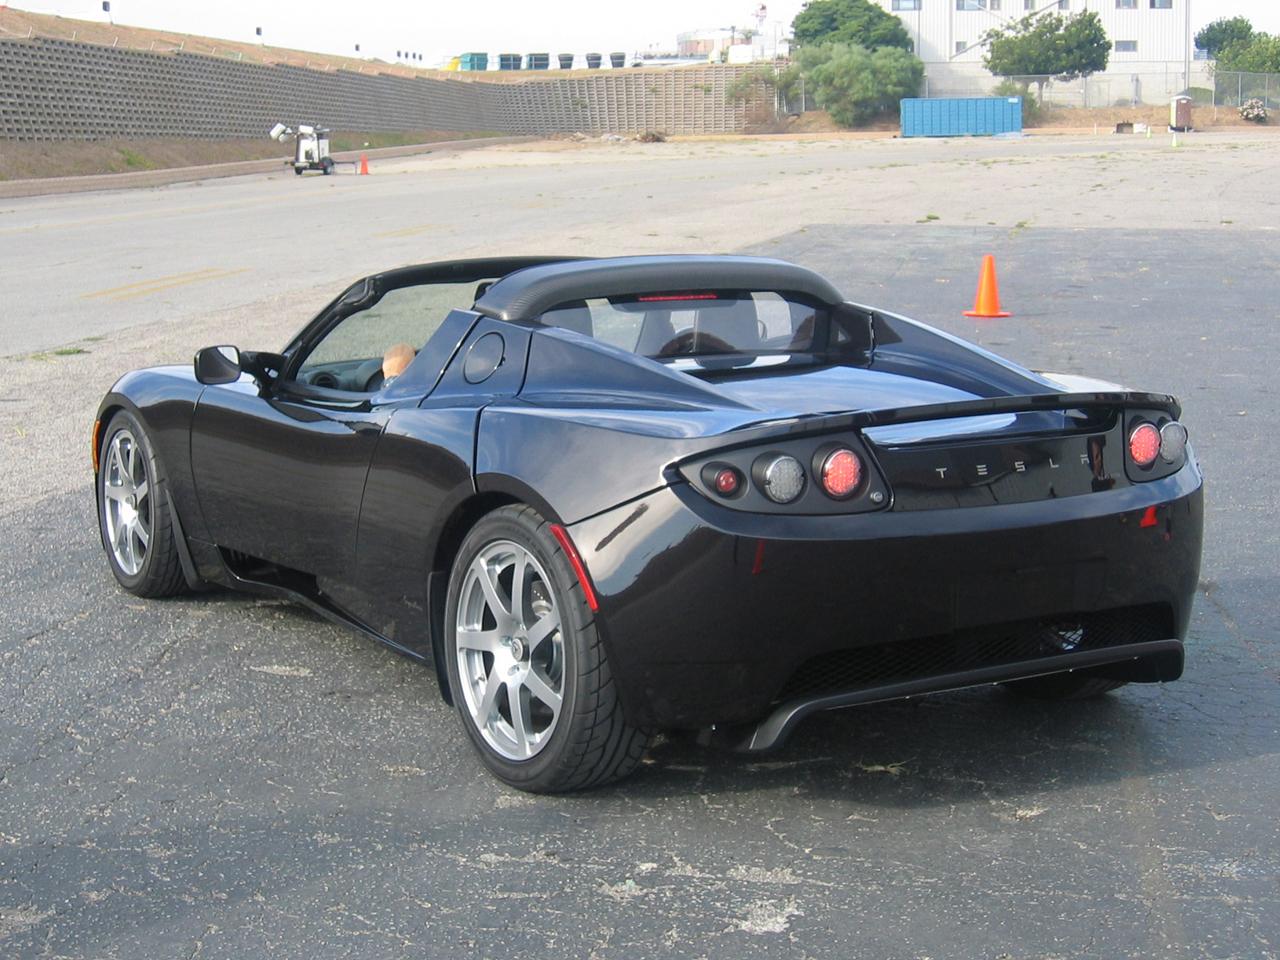 2007 Tesla Roadster Pictures Cargurus